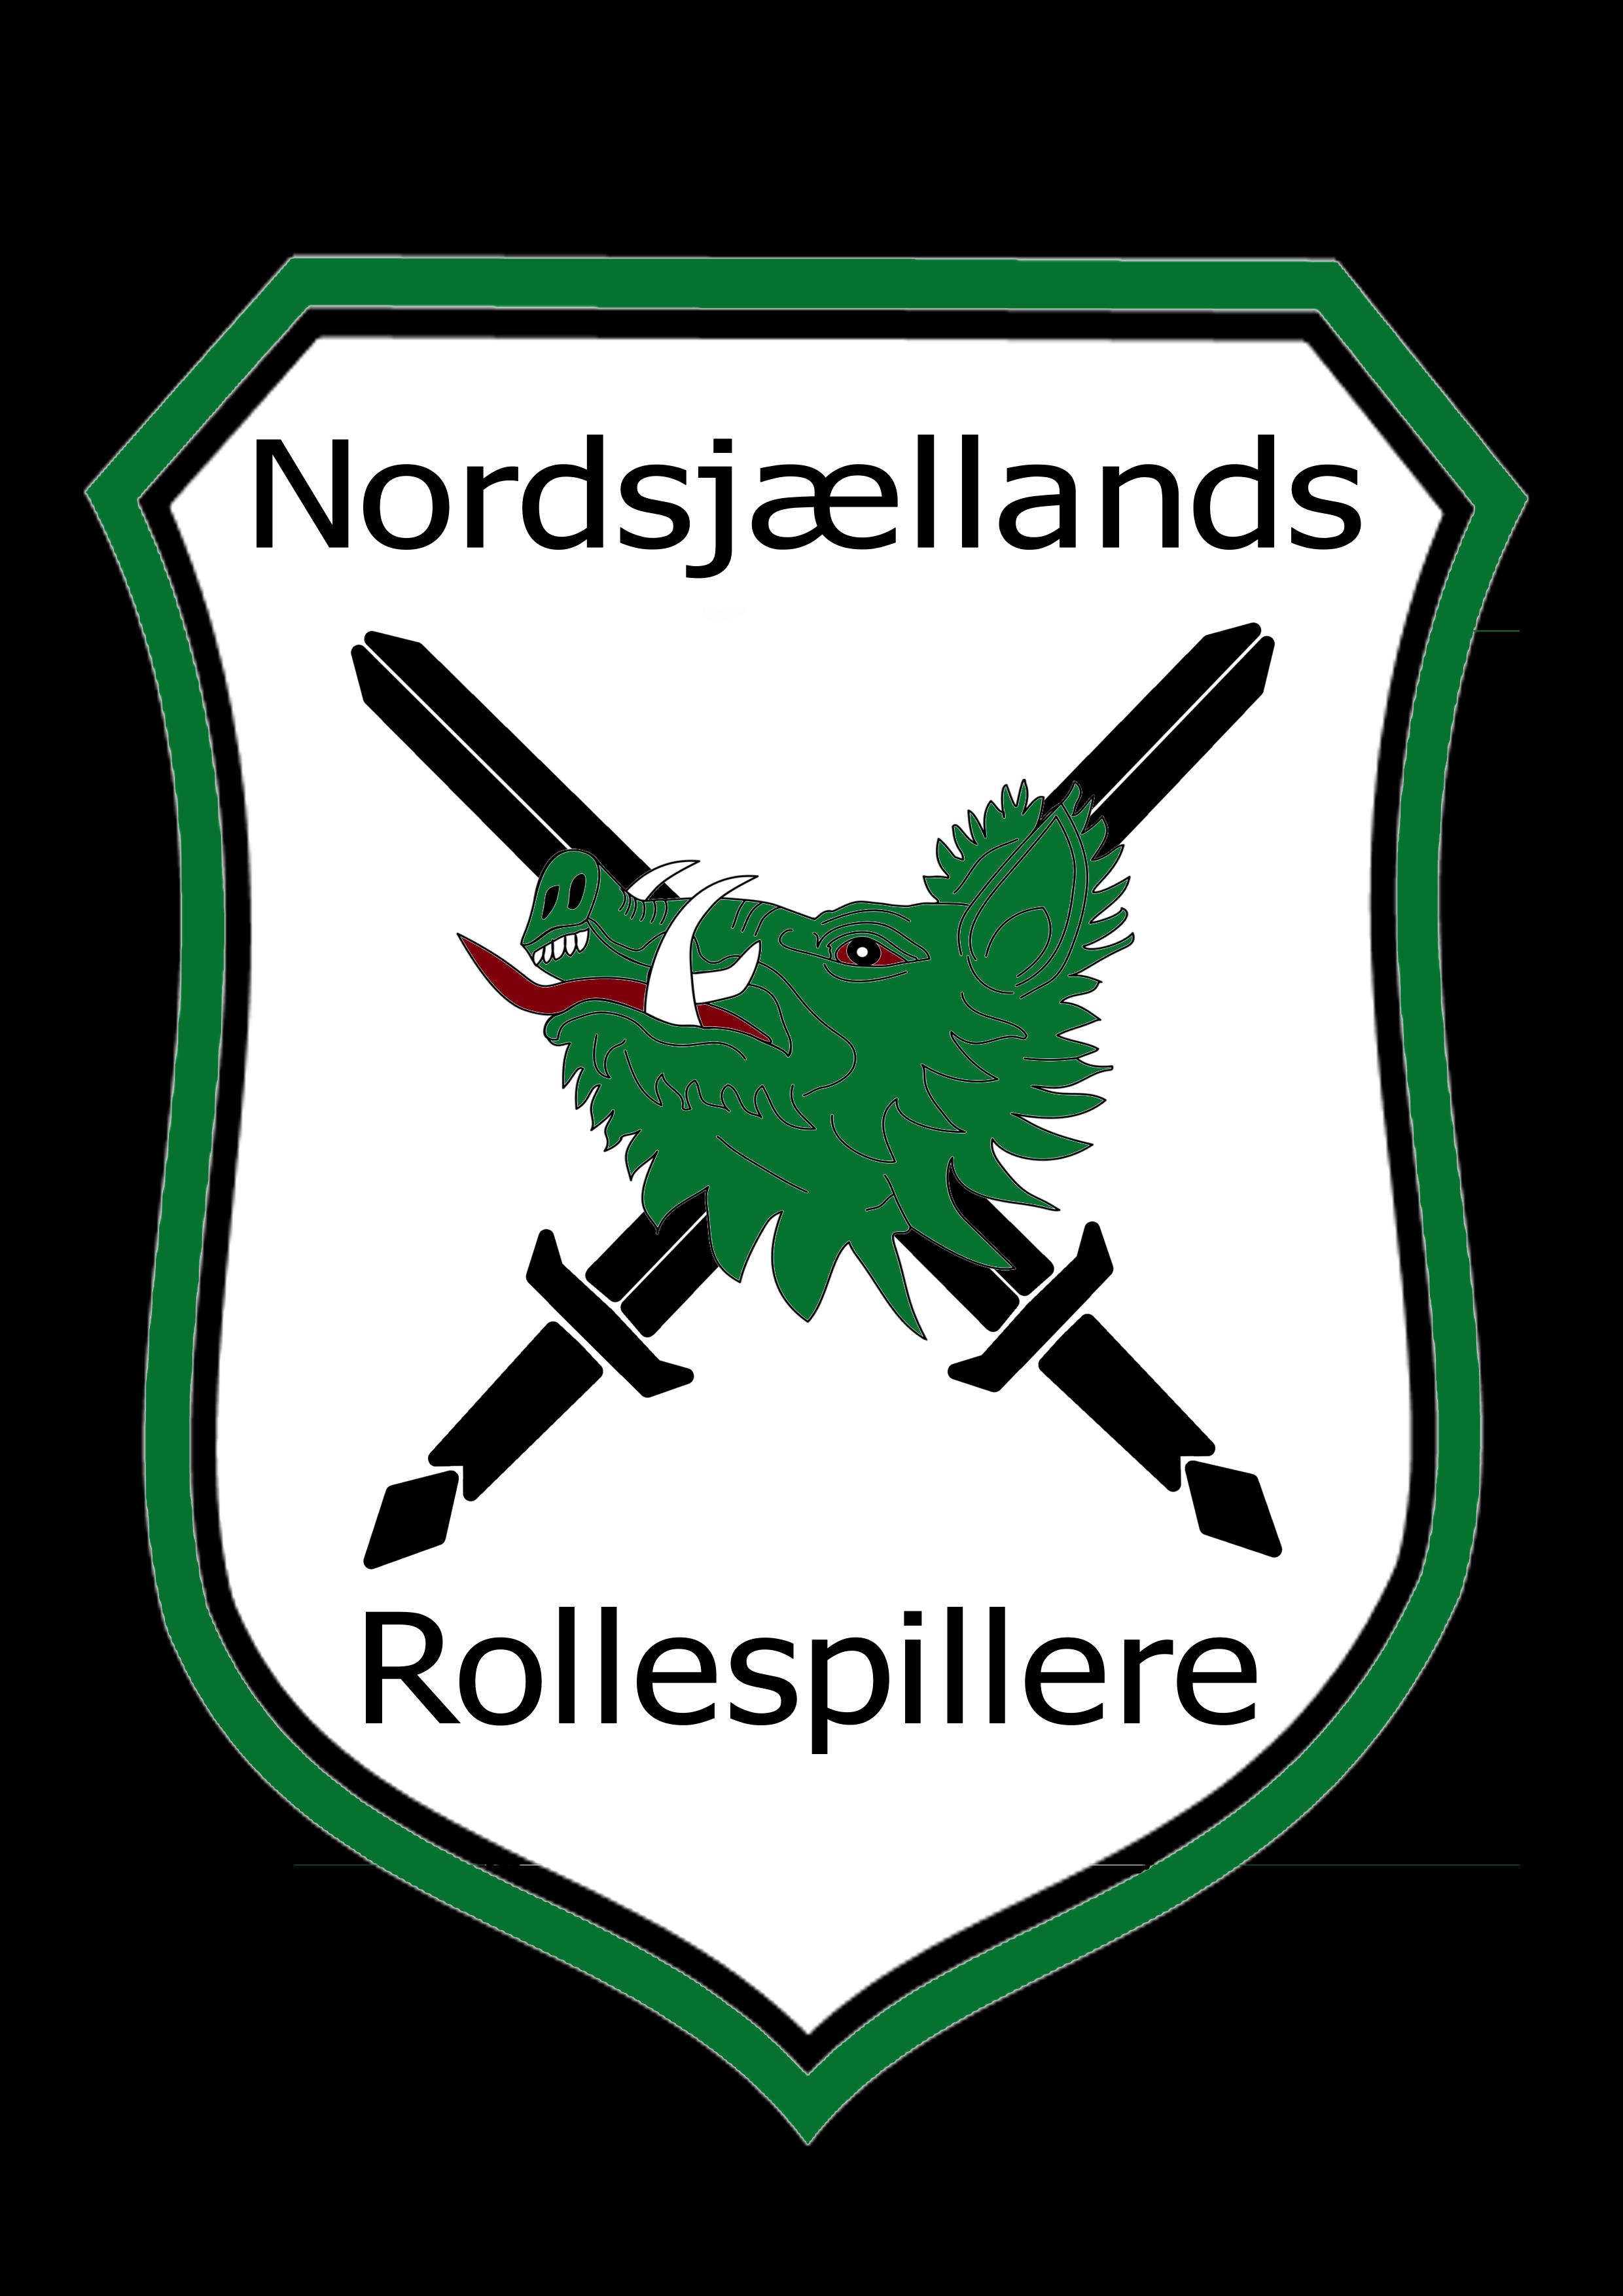 Nordsjællands Rollespilleres logo